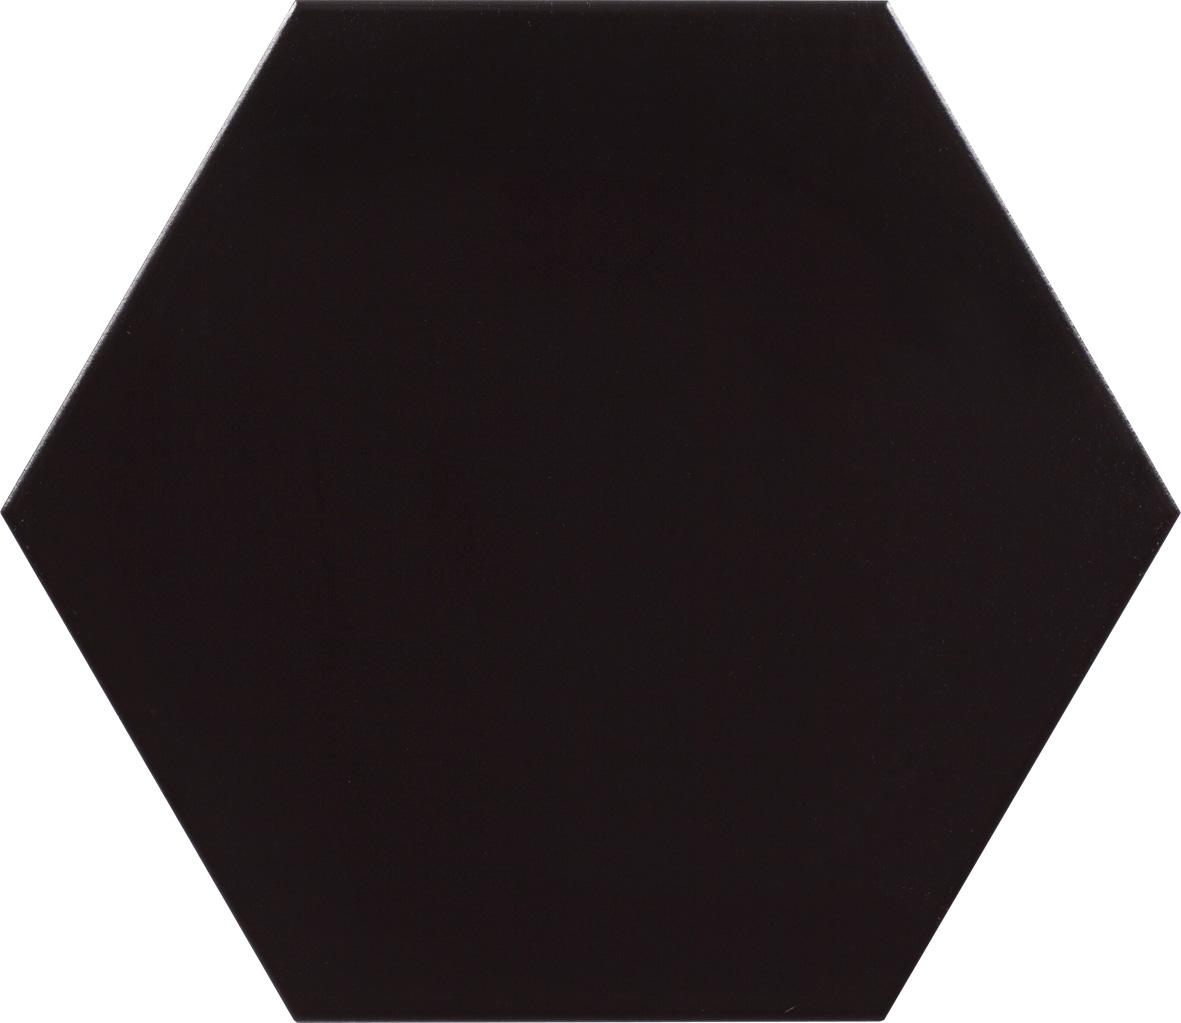 "Negro - 10""Porcelain Hexagon"